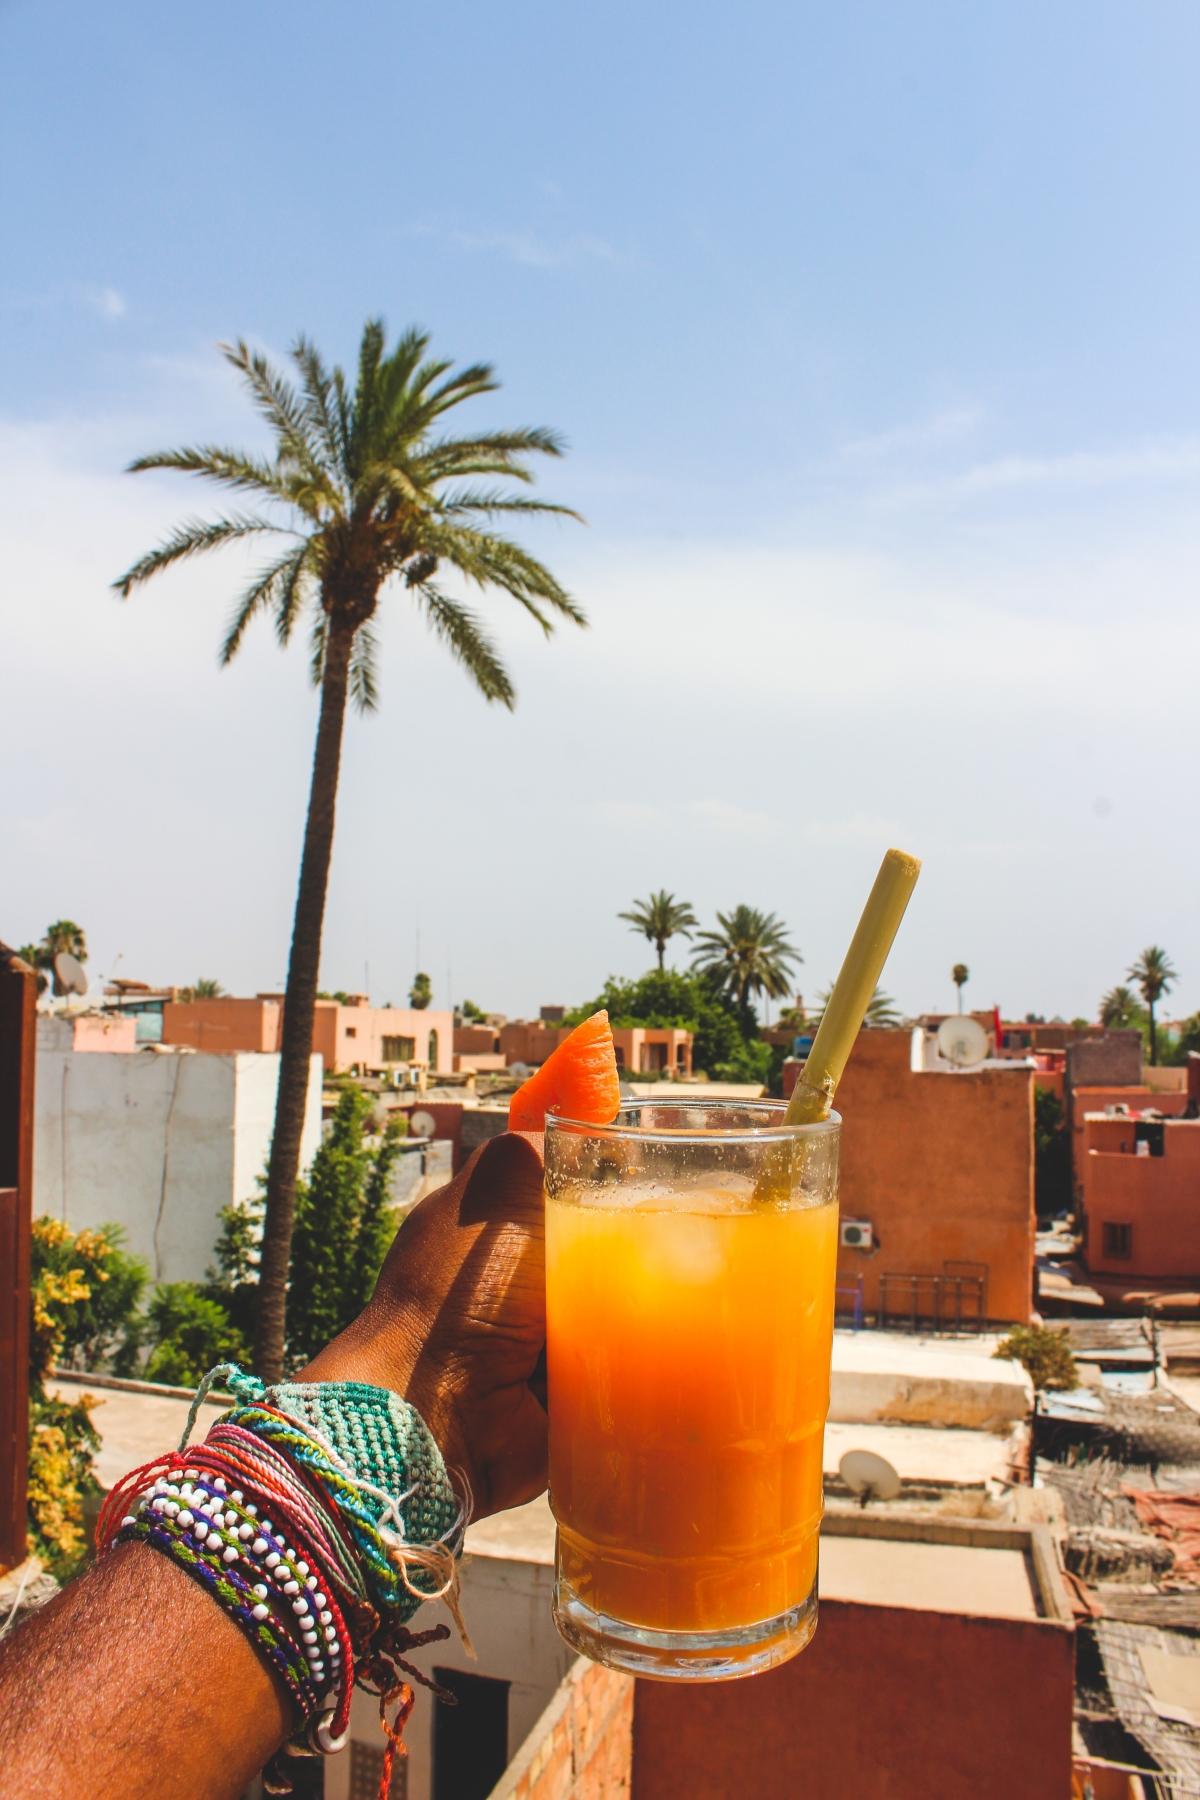 Marrakesh: frissen facsart narancslé minden sarkon